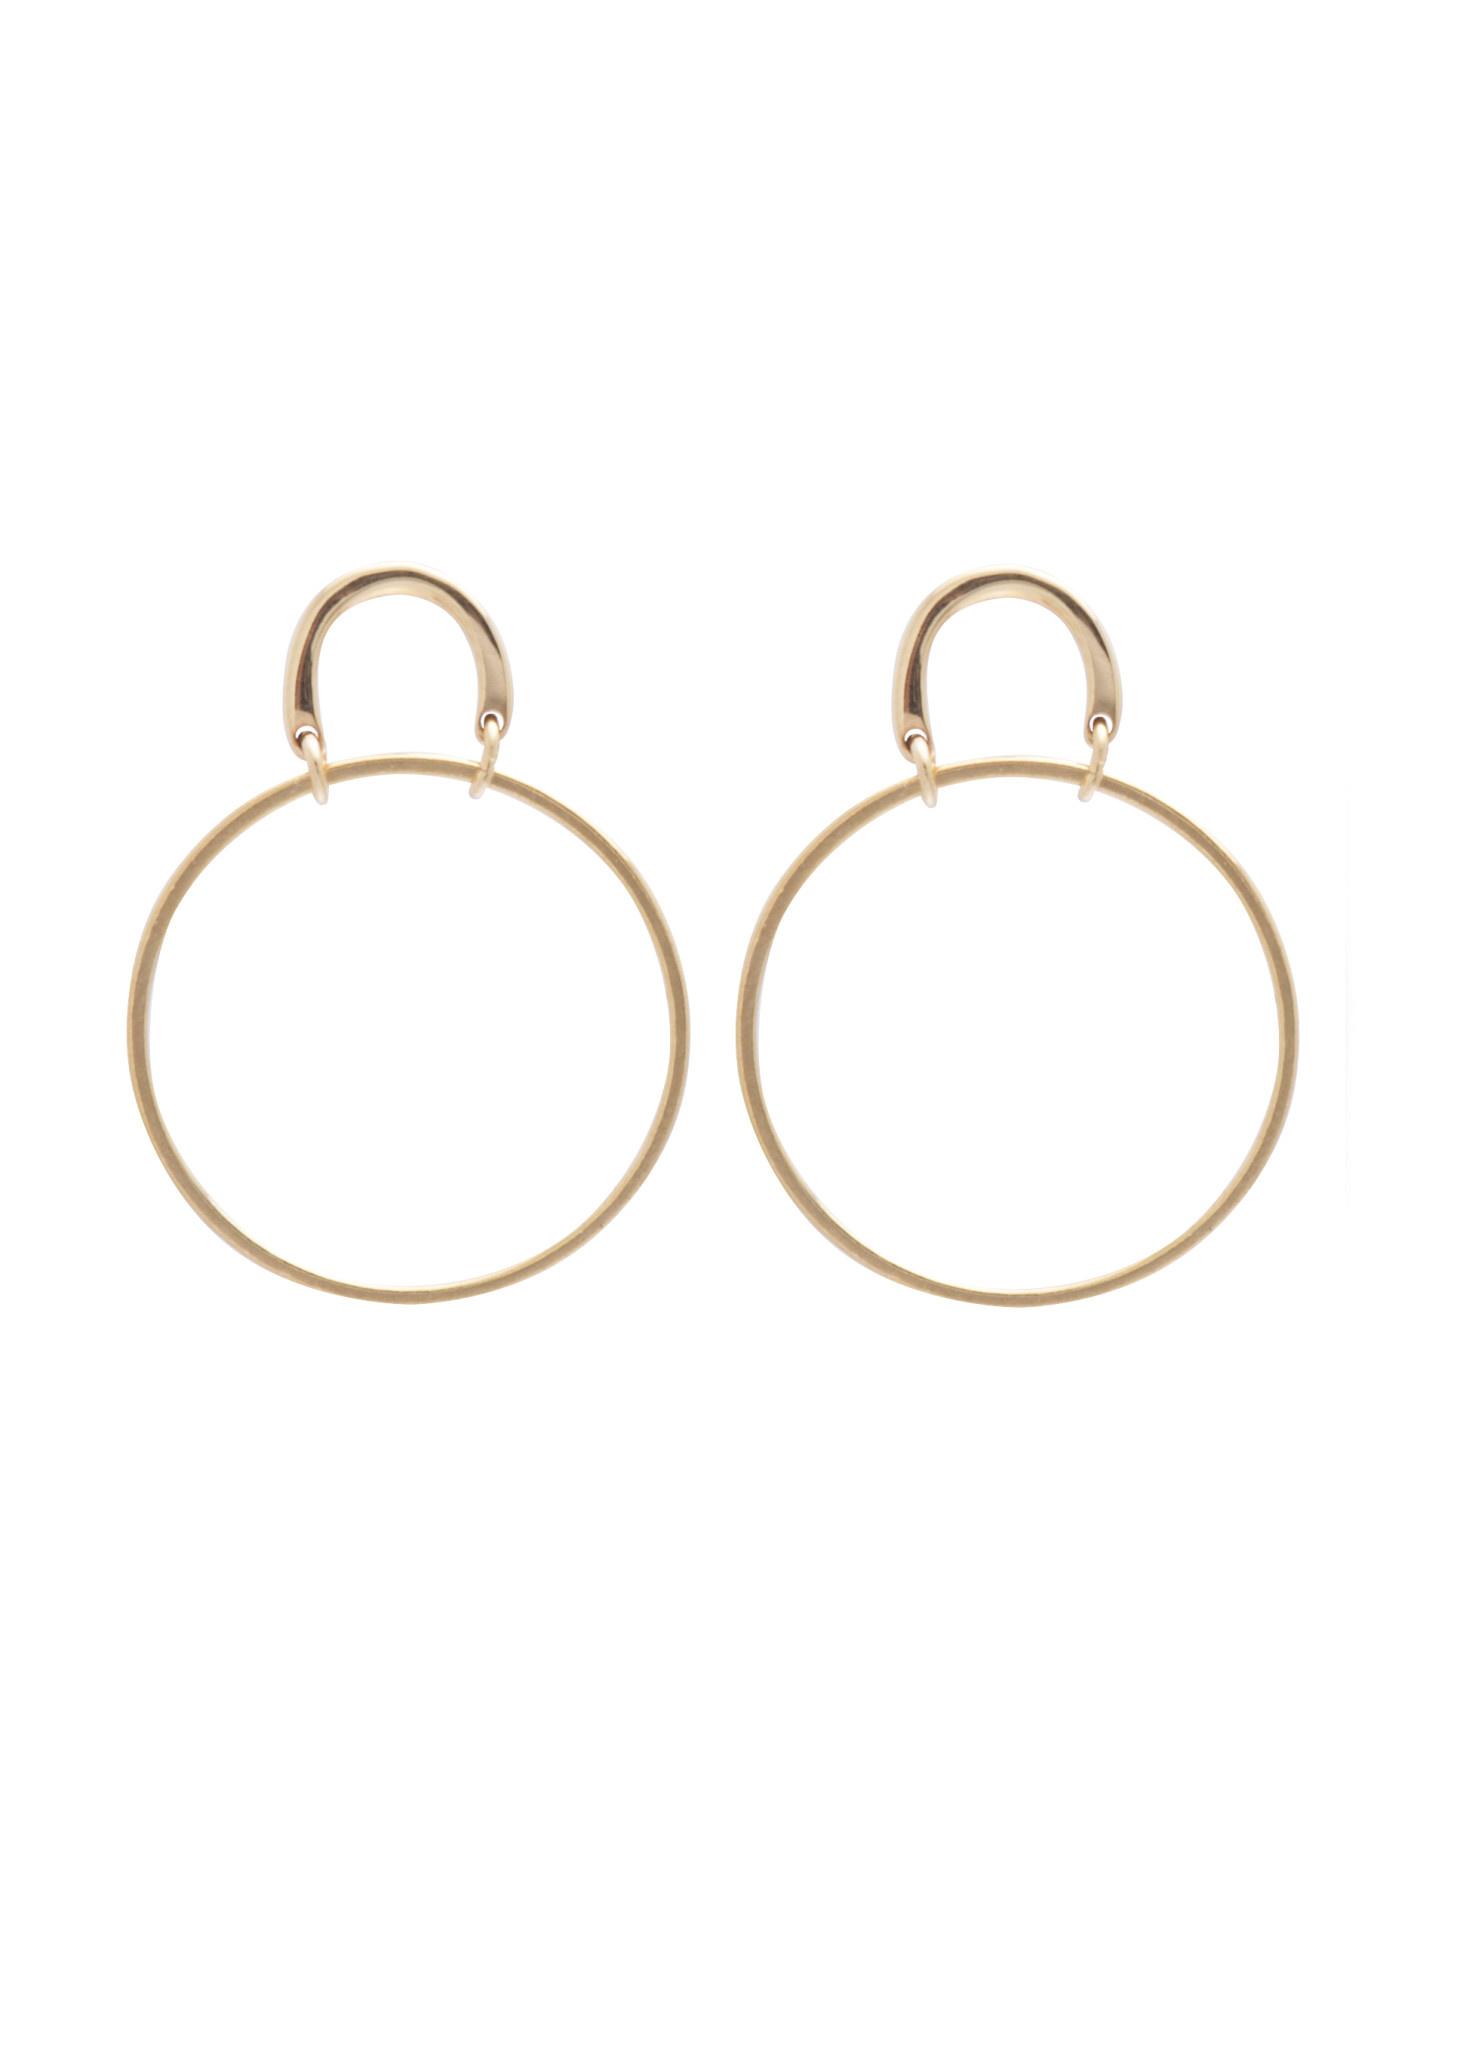 Sarah Mulder Jewelry Sarah Mulder Jewelry - Boucles d'oreilles Henny